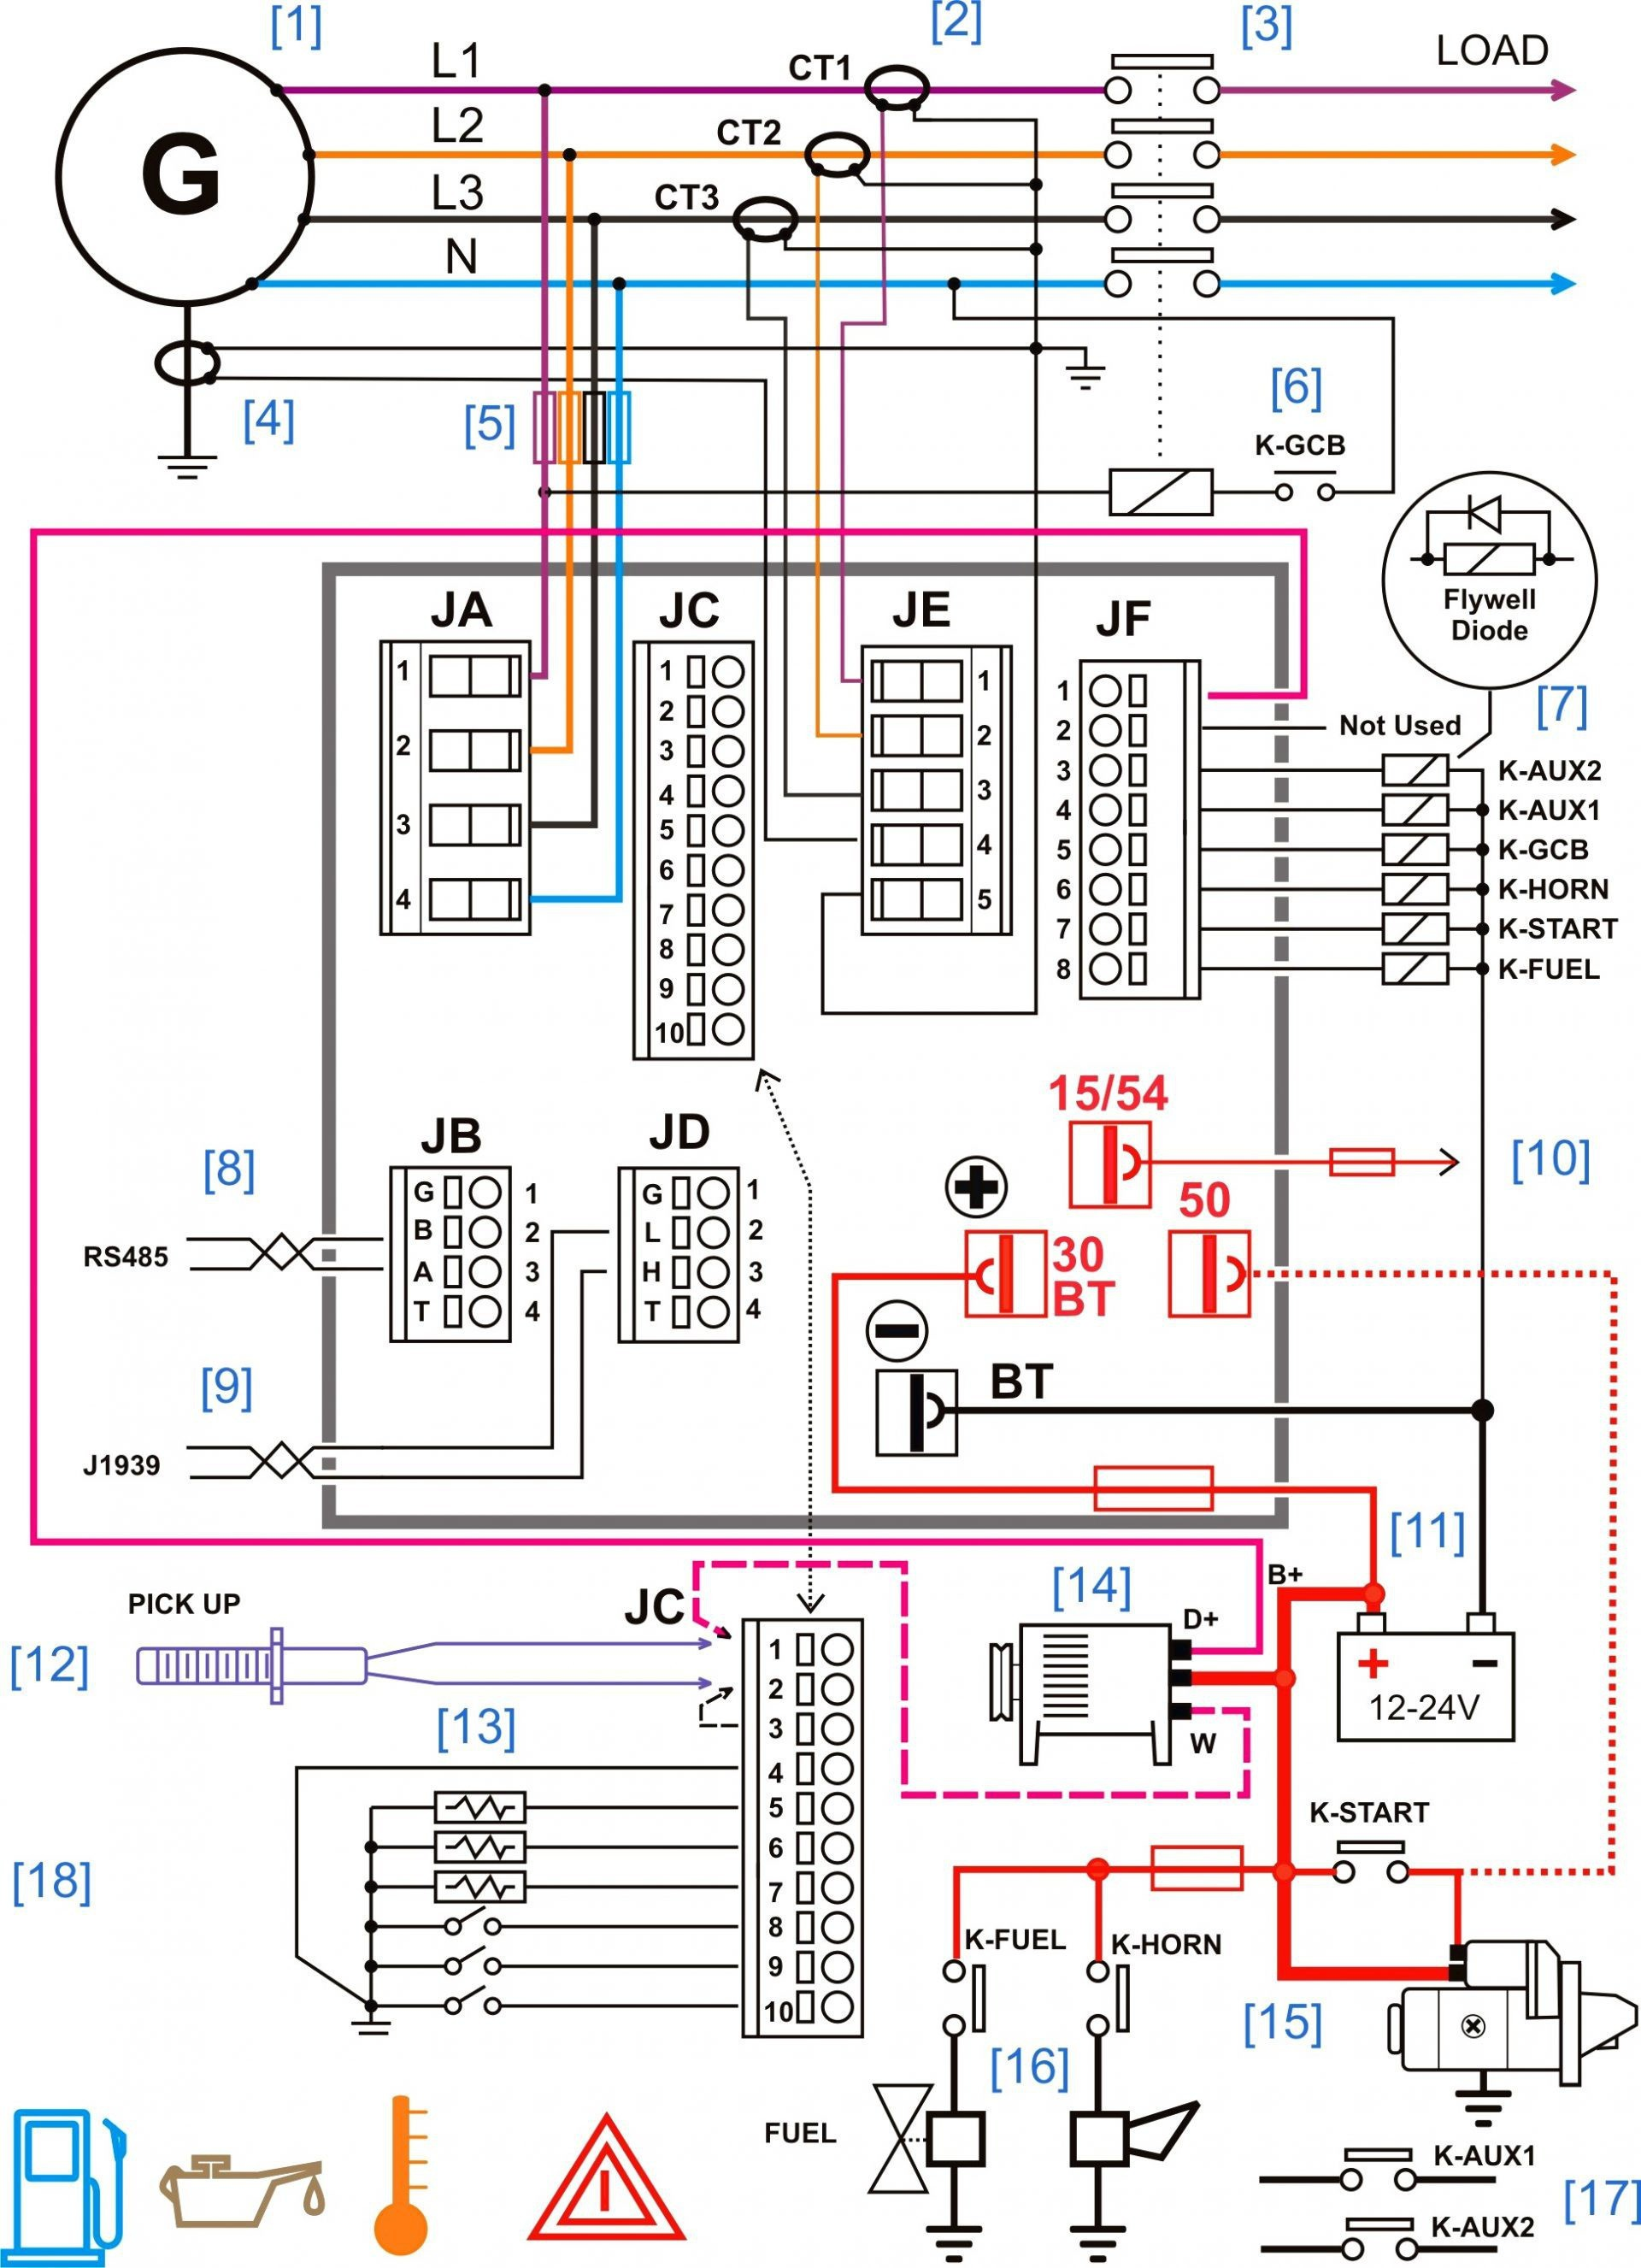 DIAGRAM] Fulham Workhorse 5 Ballast Wiring Diagram FULL Version HD Quality Wiring  Diagram - MMCDIAGRAM64.CASAMANUELLI.IT | Workhorse 8 Wiring Diagram |  | mmcdiagram64.casamanuelli.it